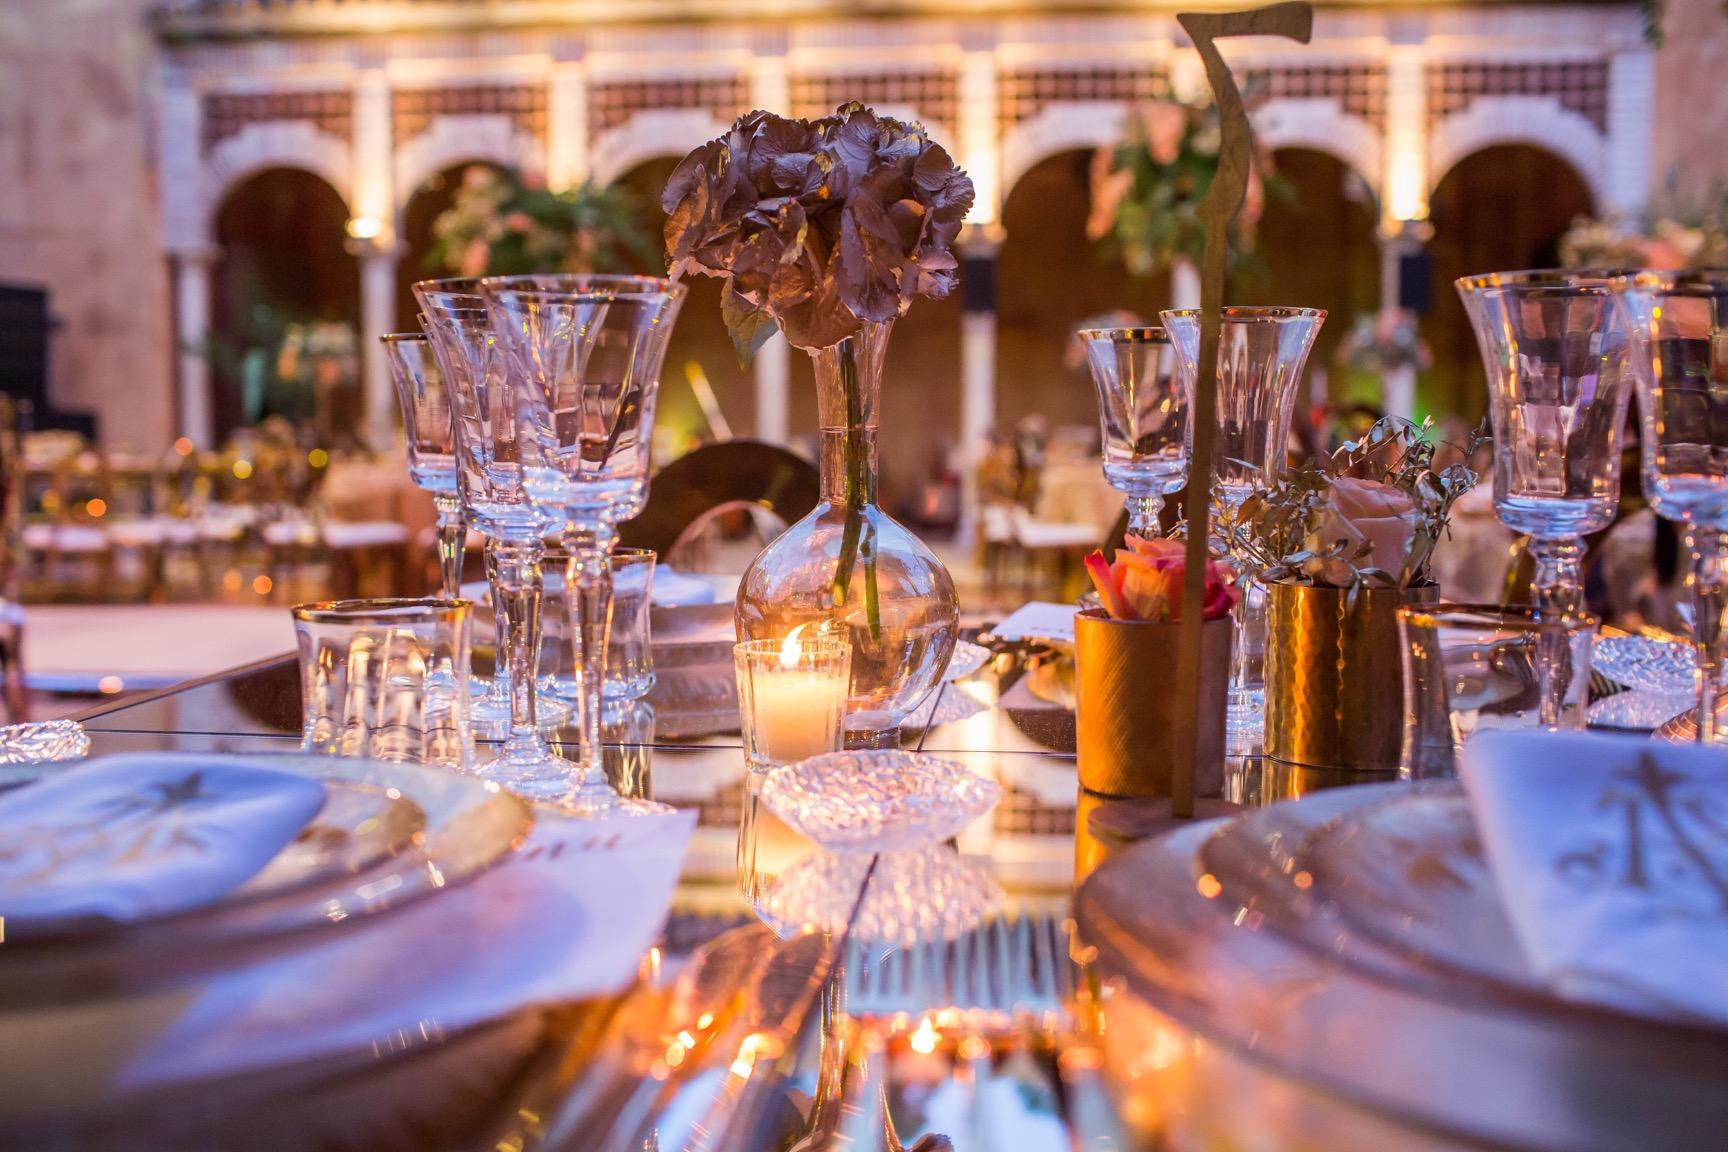 Si-Quiero-Wedding-Planner-By-Sira-Antequera-Bodas-Málaga-Marbella-Miami- L-A-33